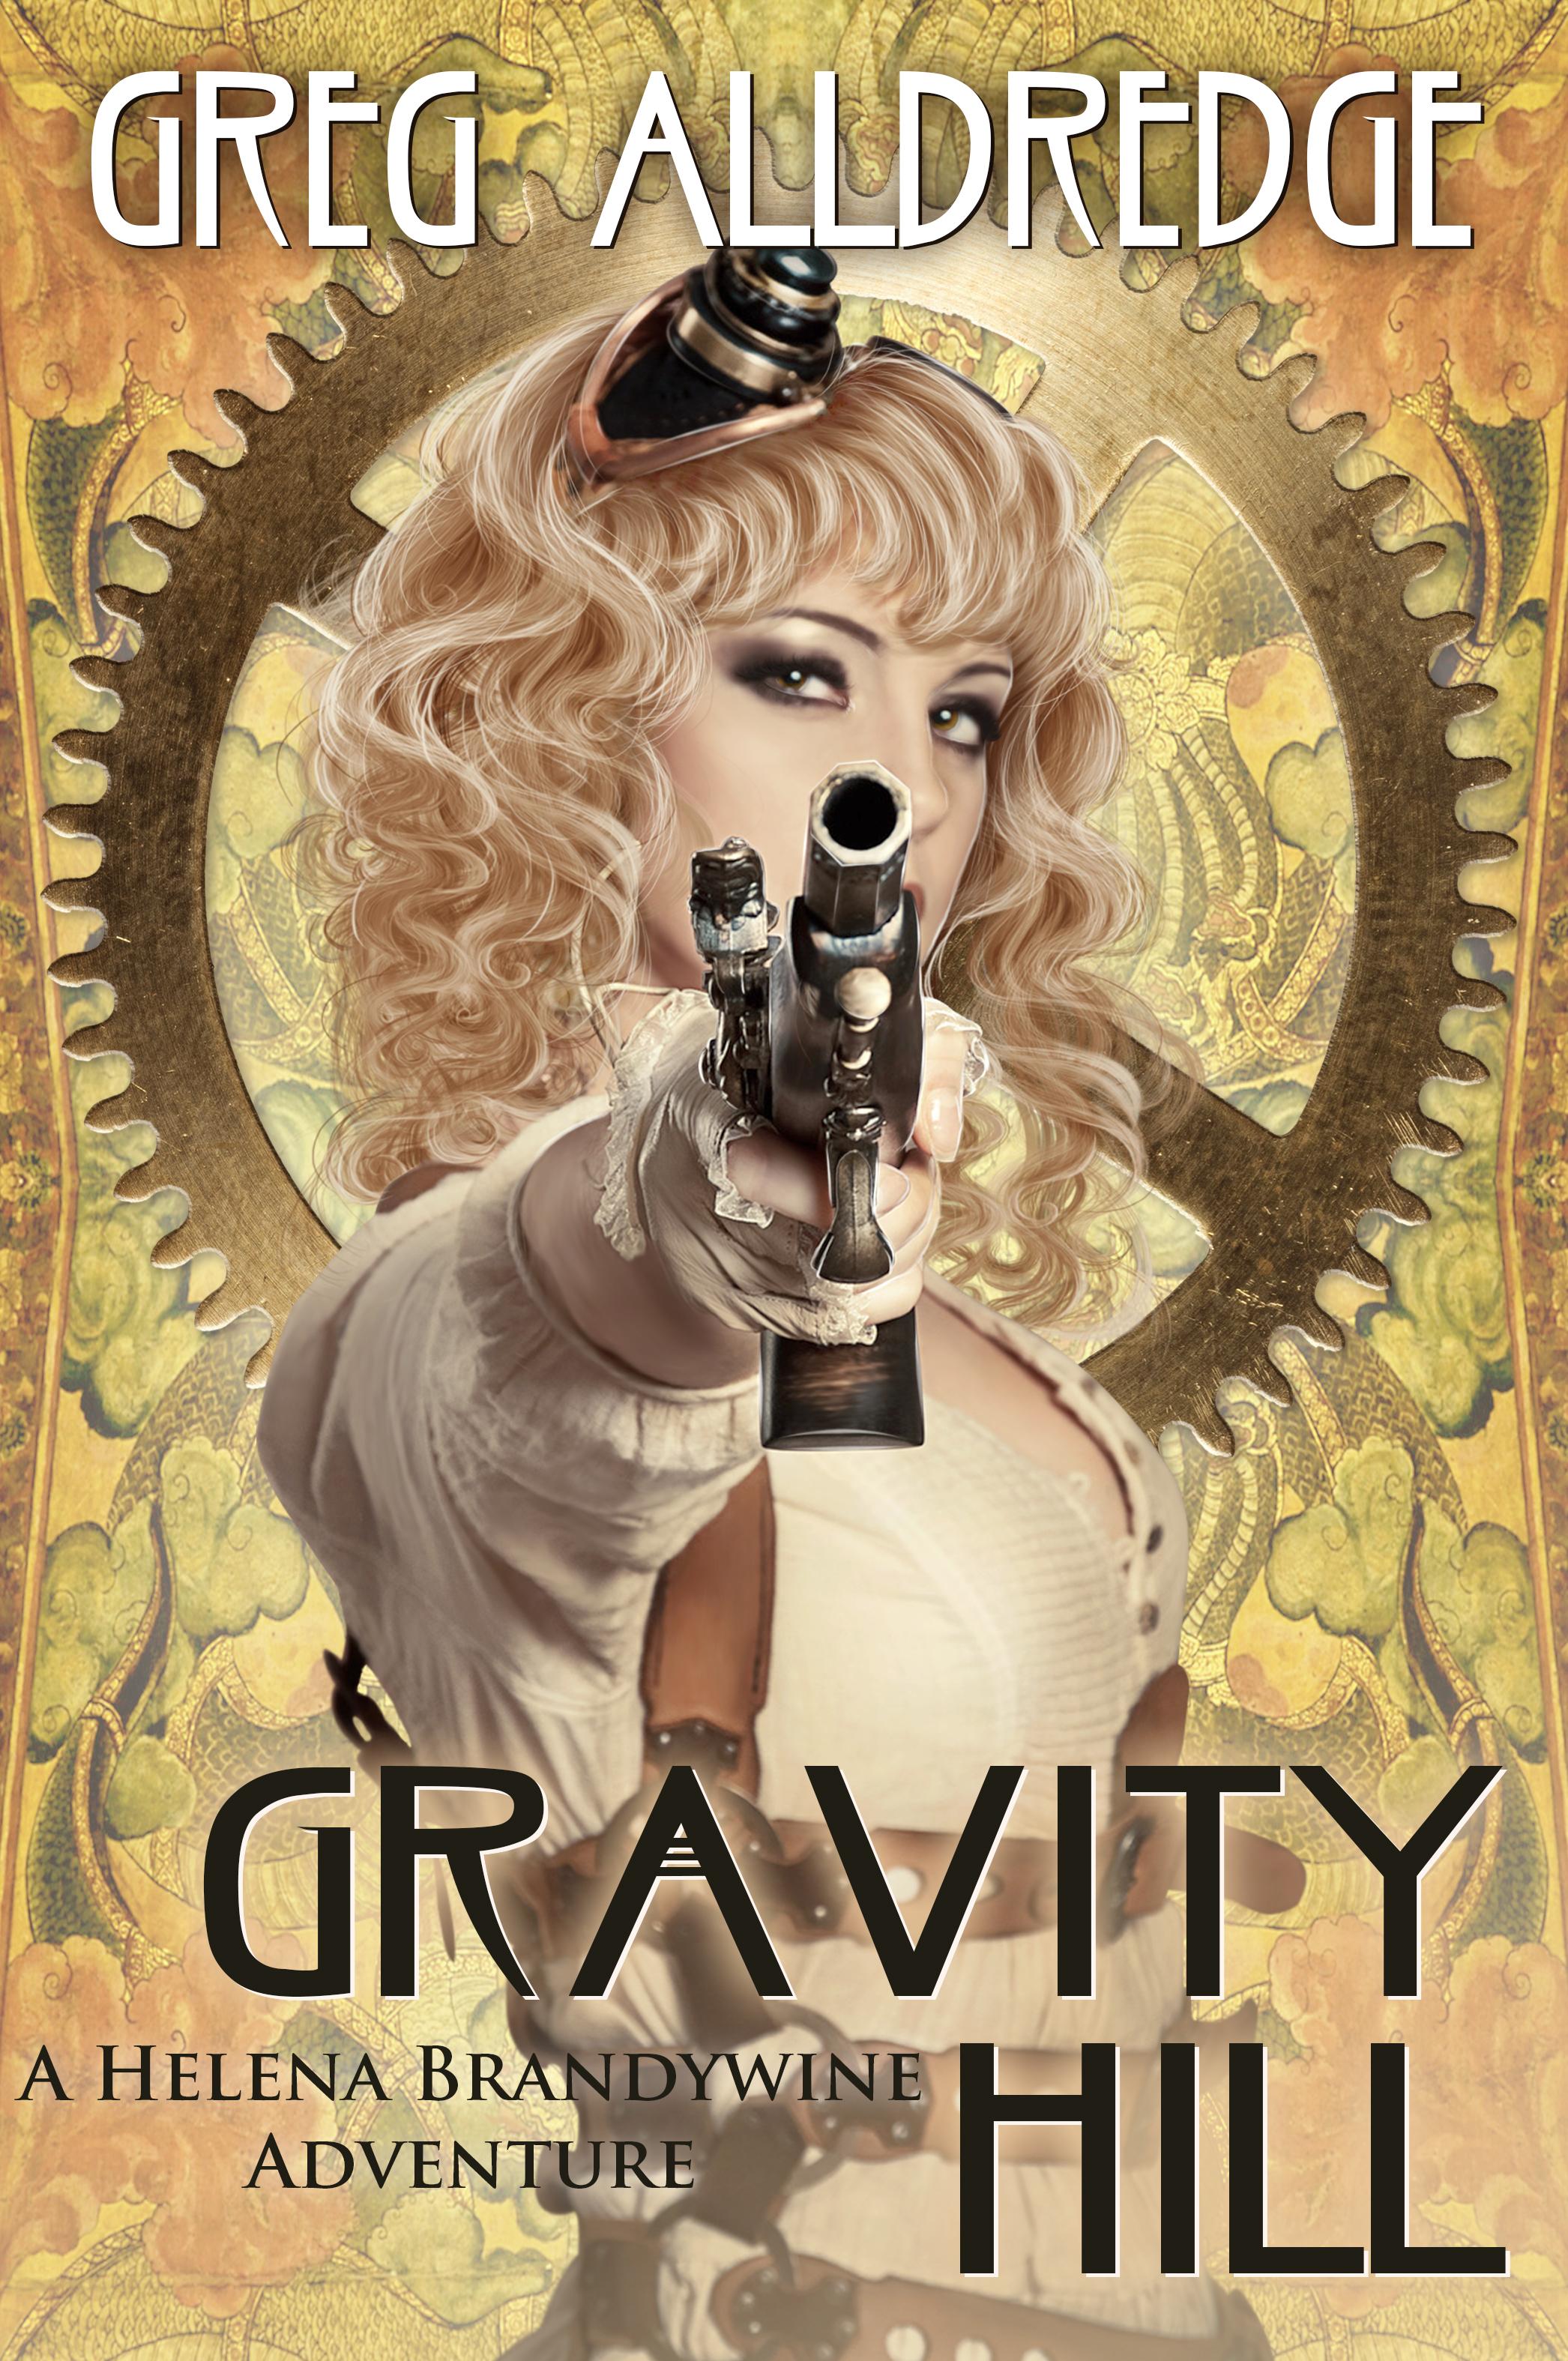 Gravity Hill